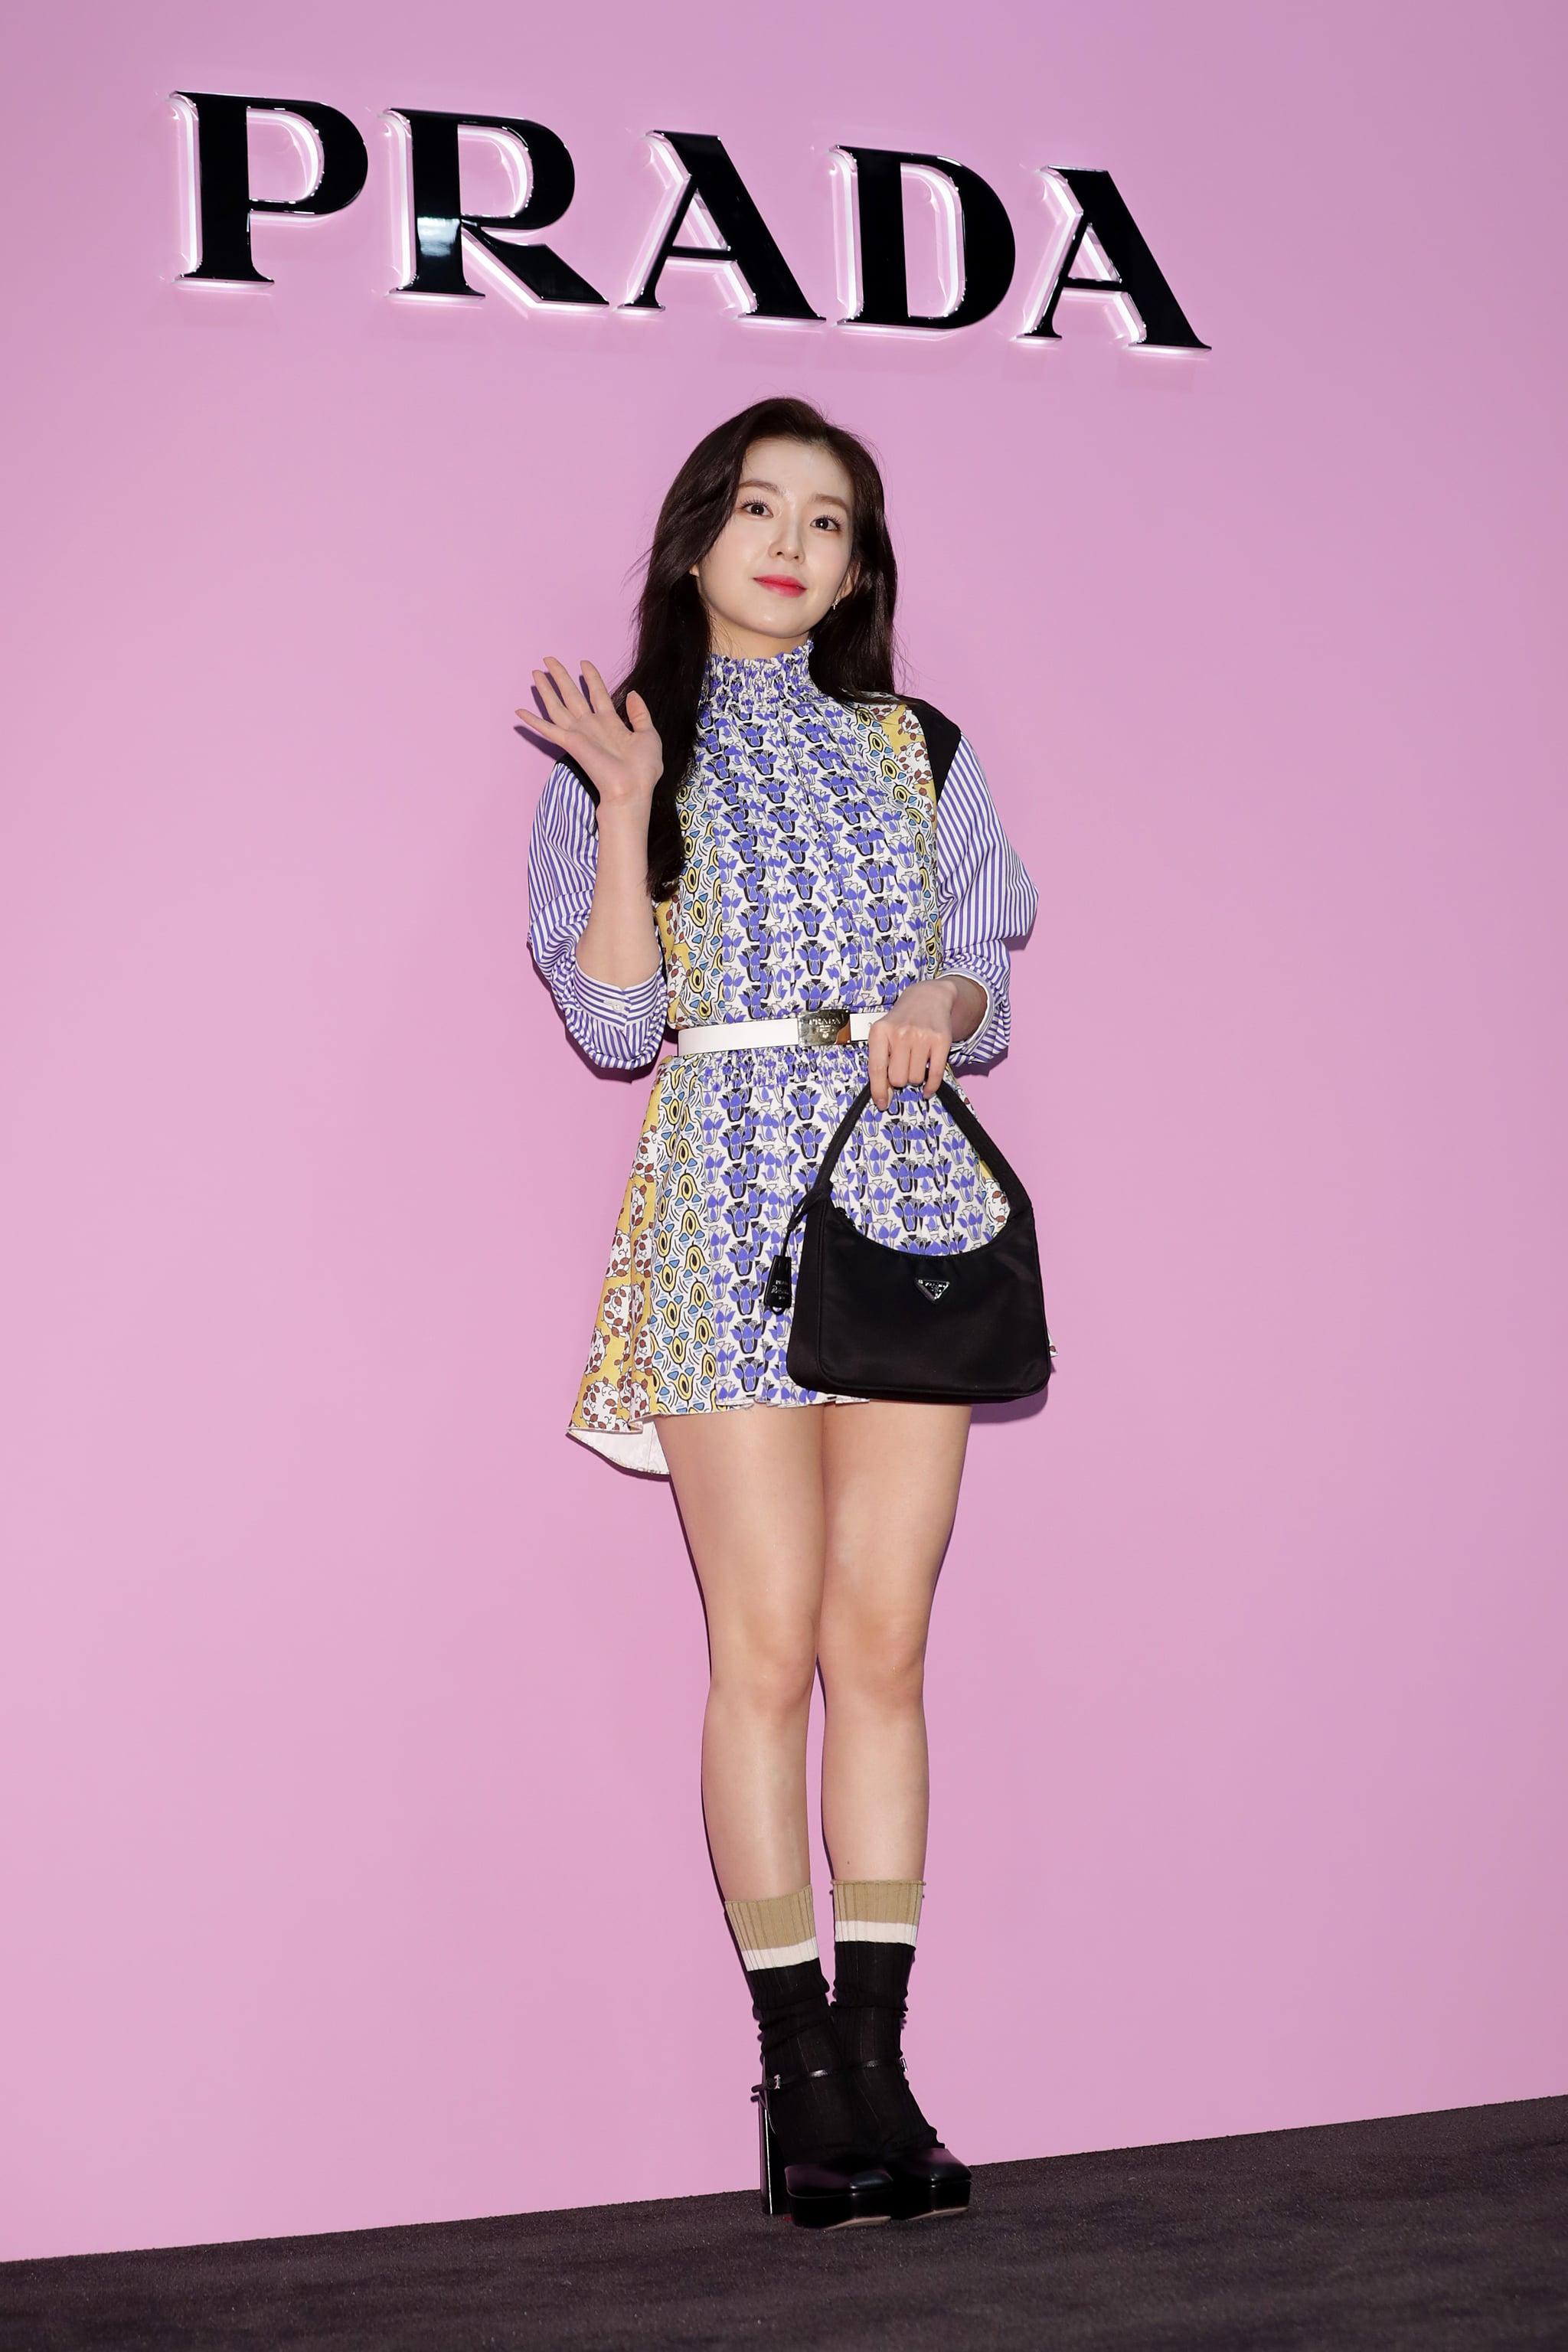 The Prada Nylon Bag Trend Is Back In 2020 Popsugar Fashion